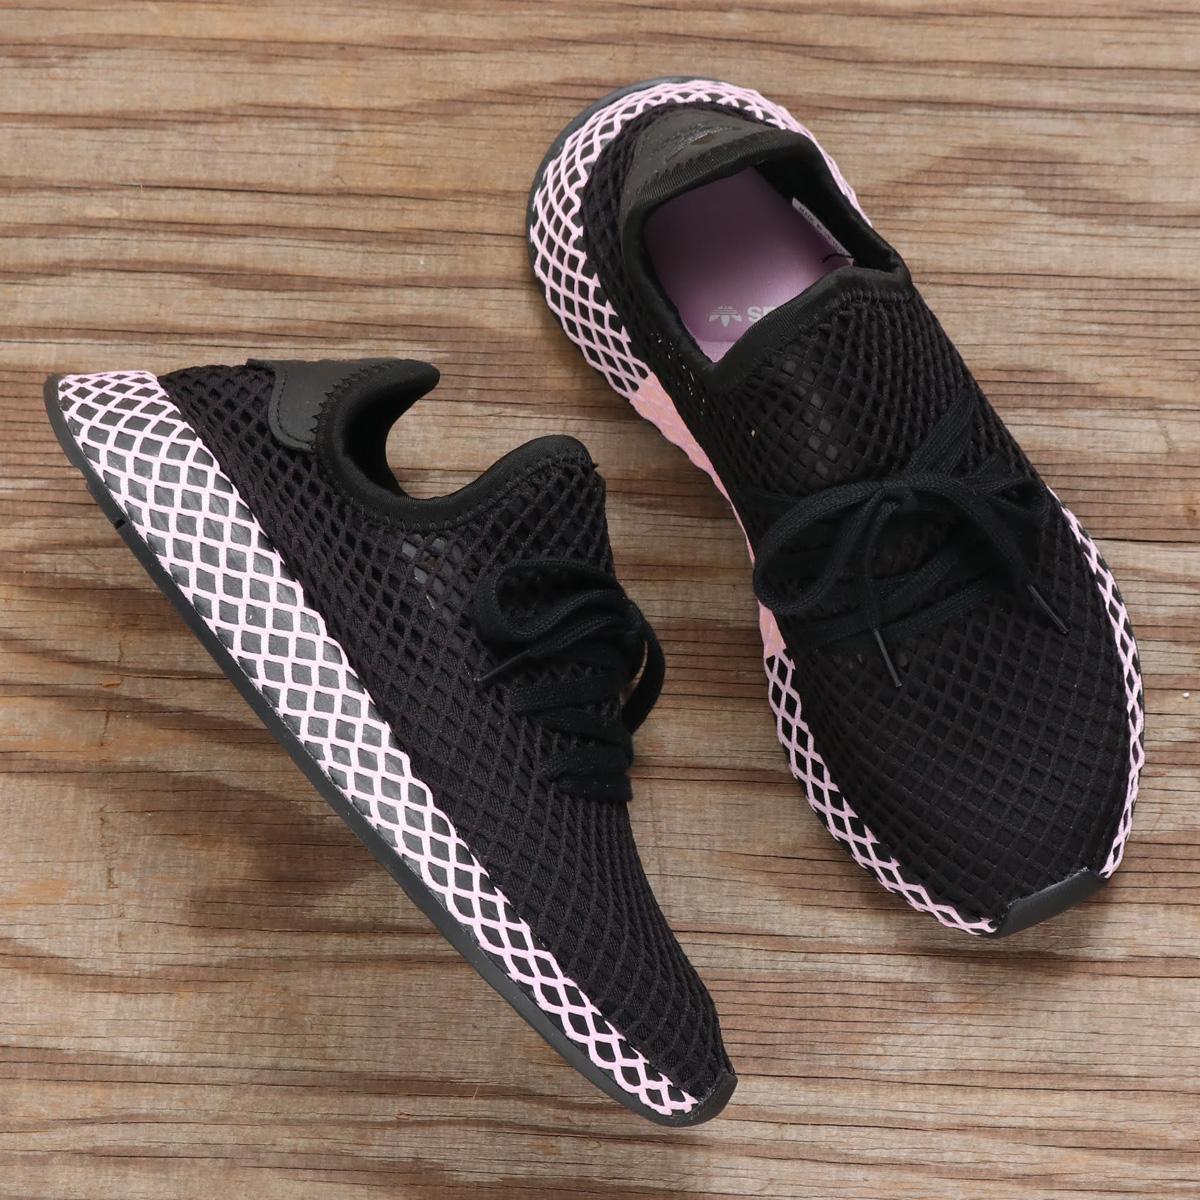 adidas Originals DEERUPT RUNNER W(アディダス オリジナルス ディーラプトランナーW)CORE BLACK/CORE BLACK/CLEAR LILAC【メンズ レディース スニーカー】18FW-I